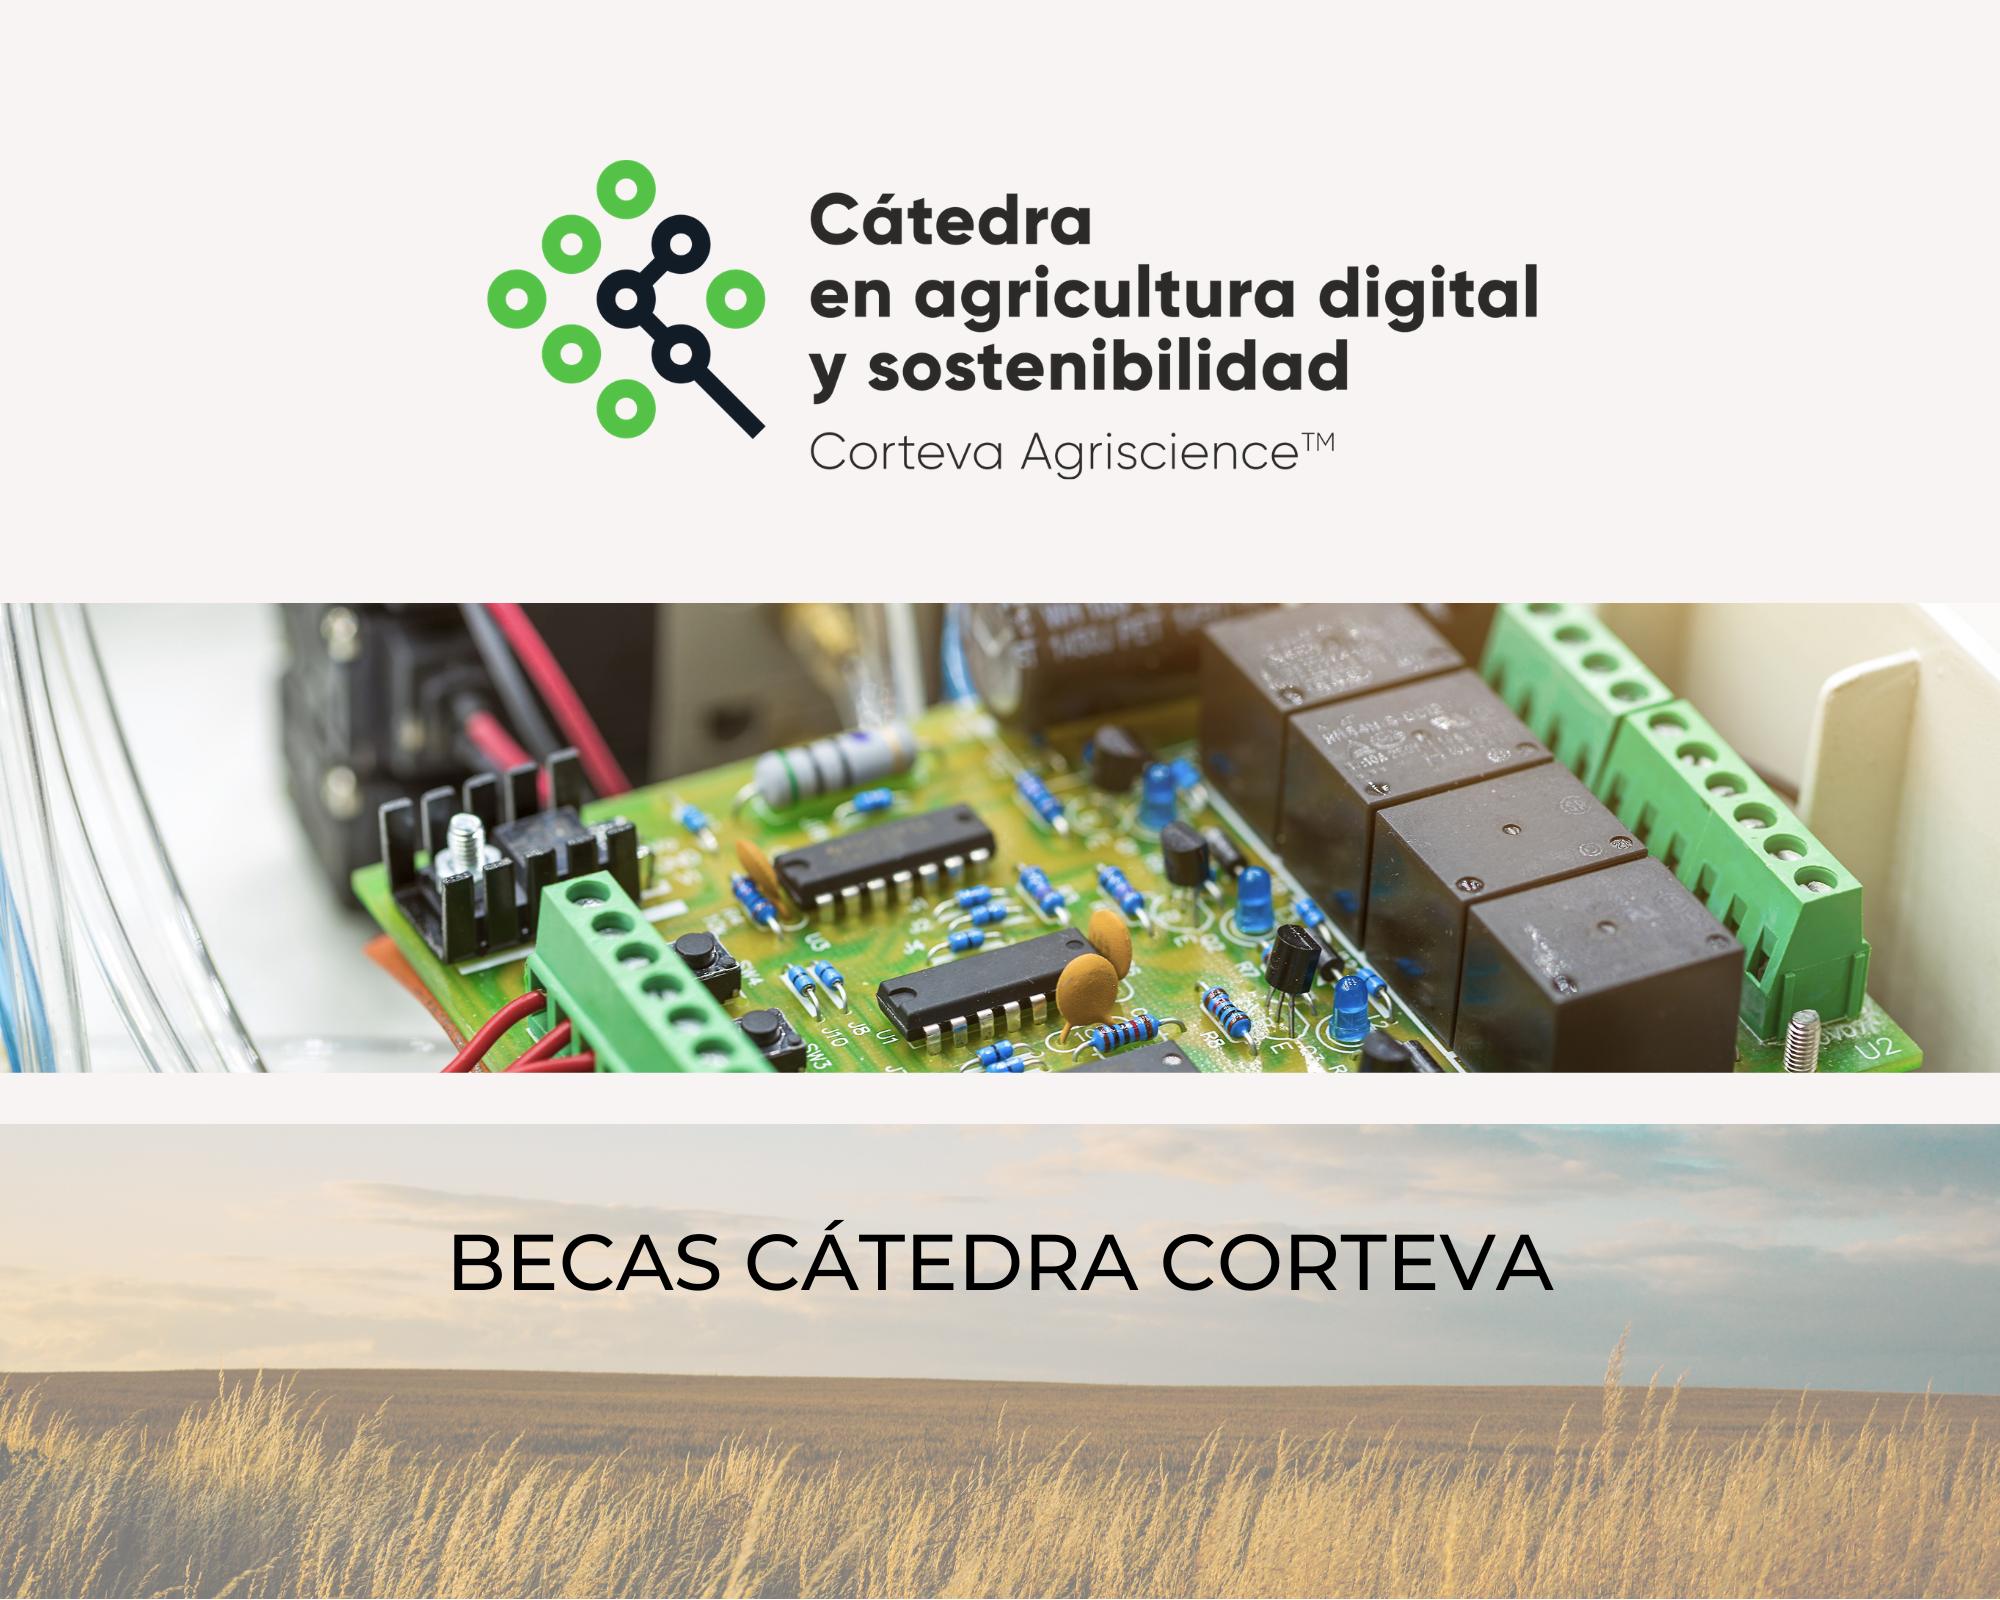 BECAS CÁTEDRA CORTEVA